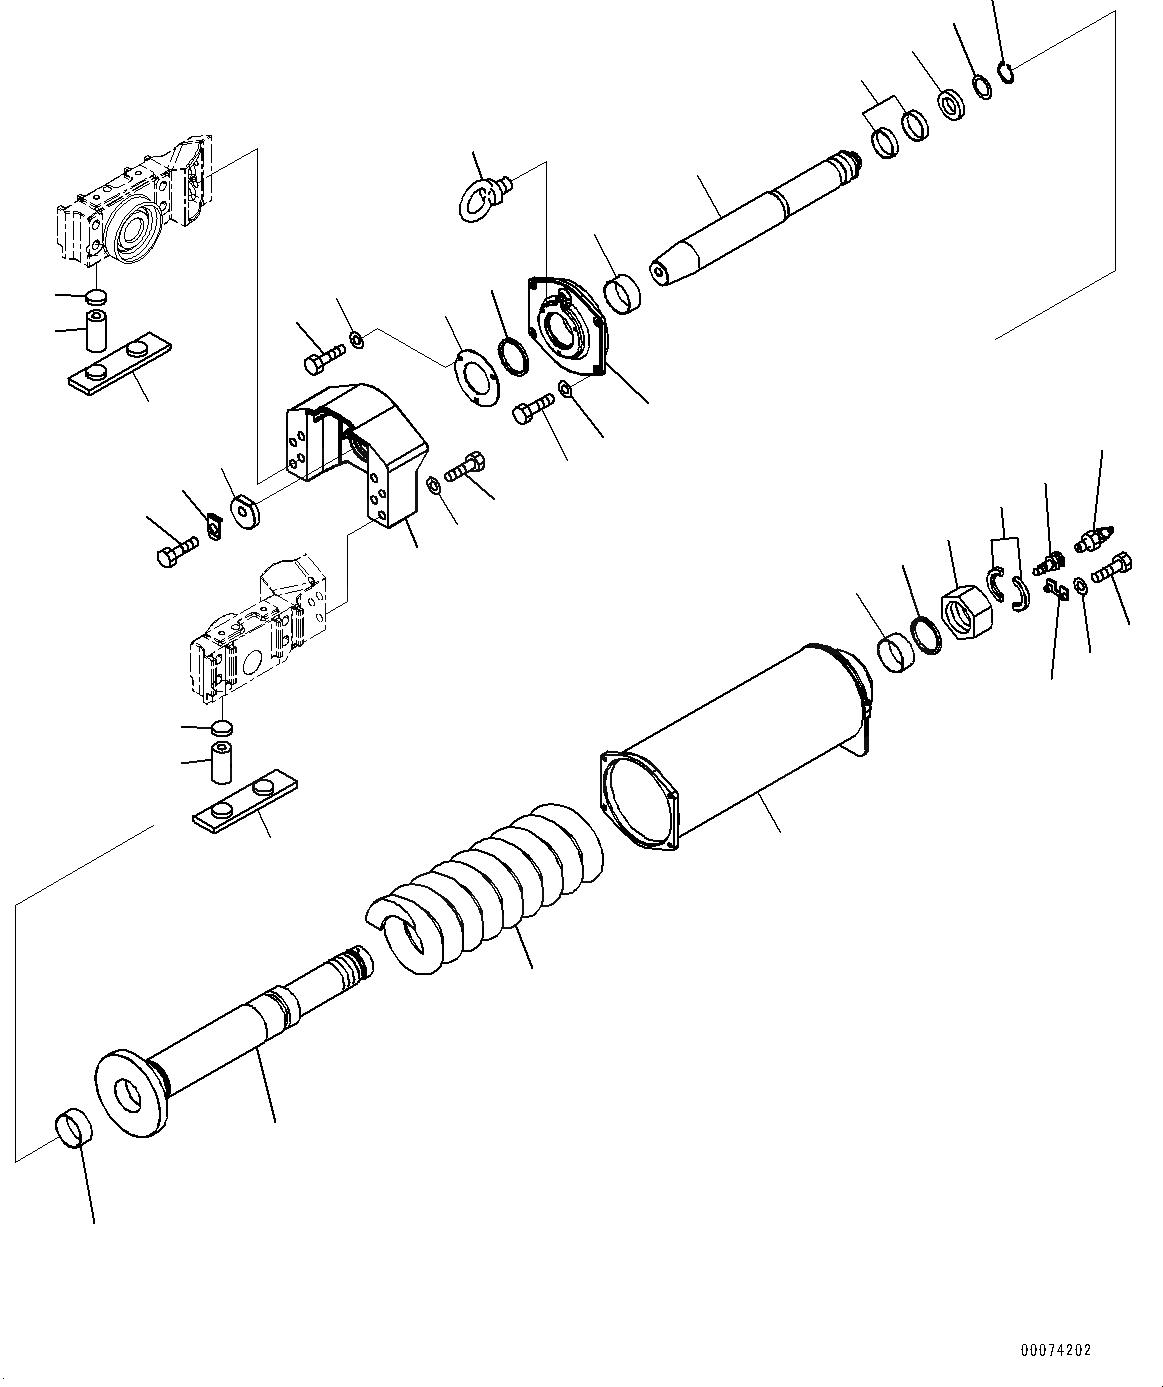 14X-30-13164 Komatsu КРОНШТЕЙН СТАЛЬ